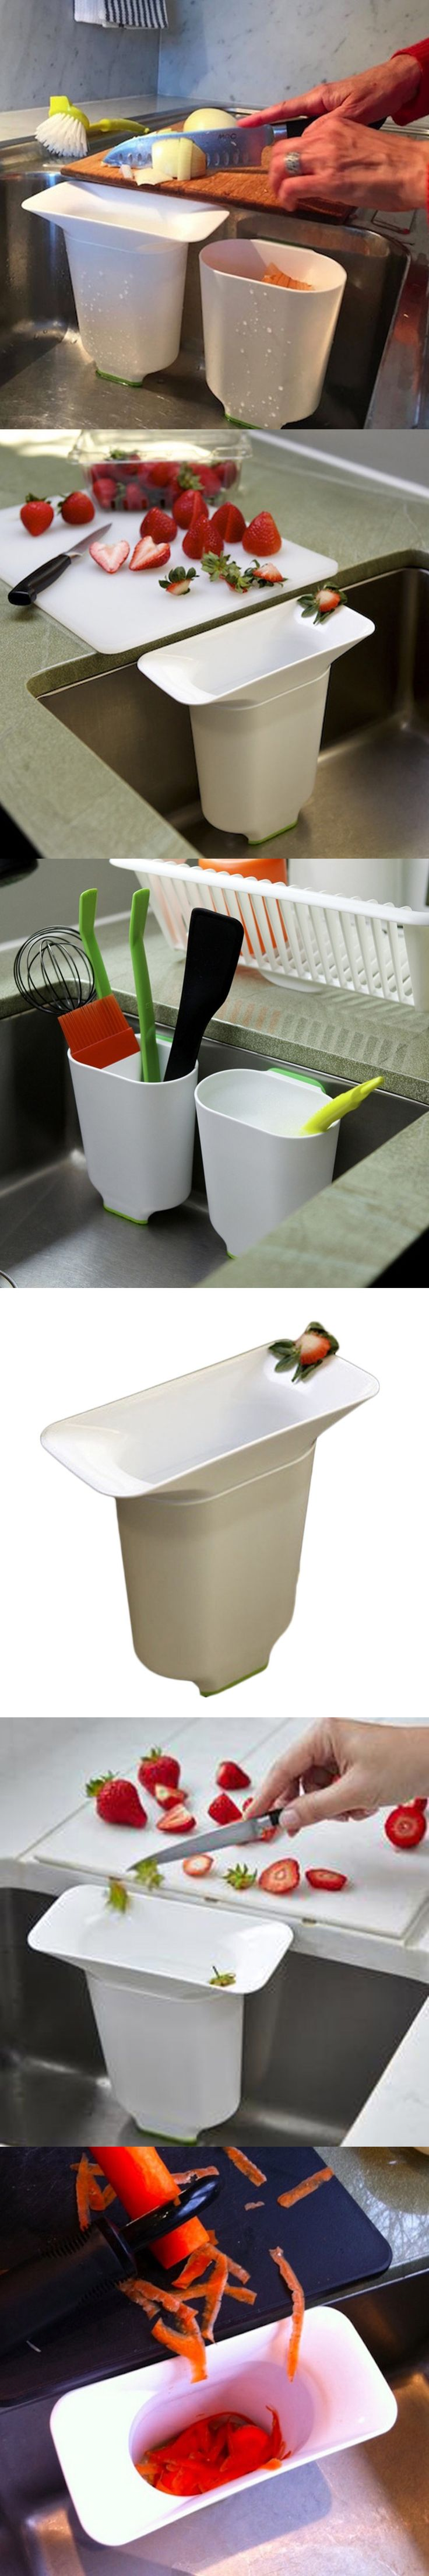 Kitchen Sink Drain Basket Drain Fruit And Vegetable Rack Shelf Storage Box Multifunctional Basket